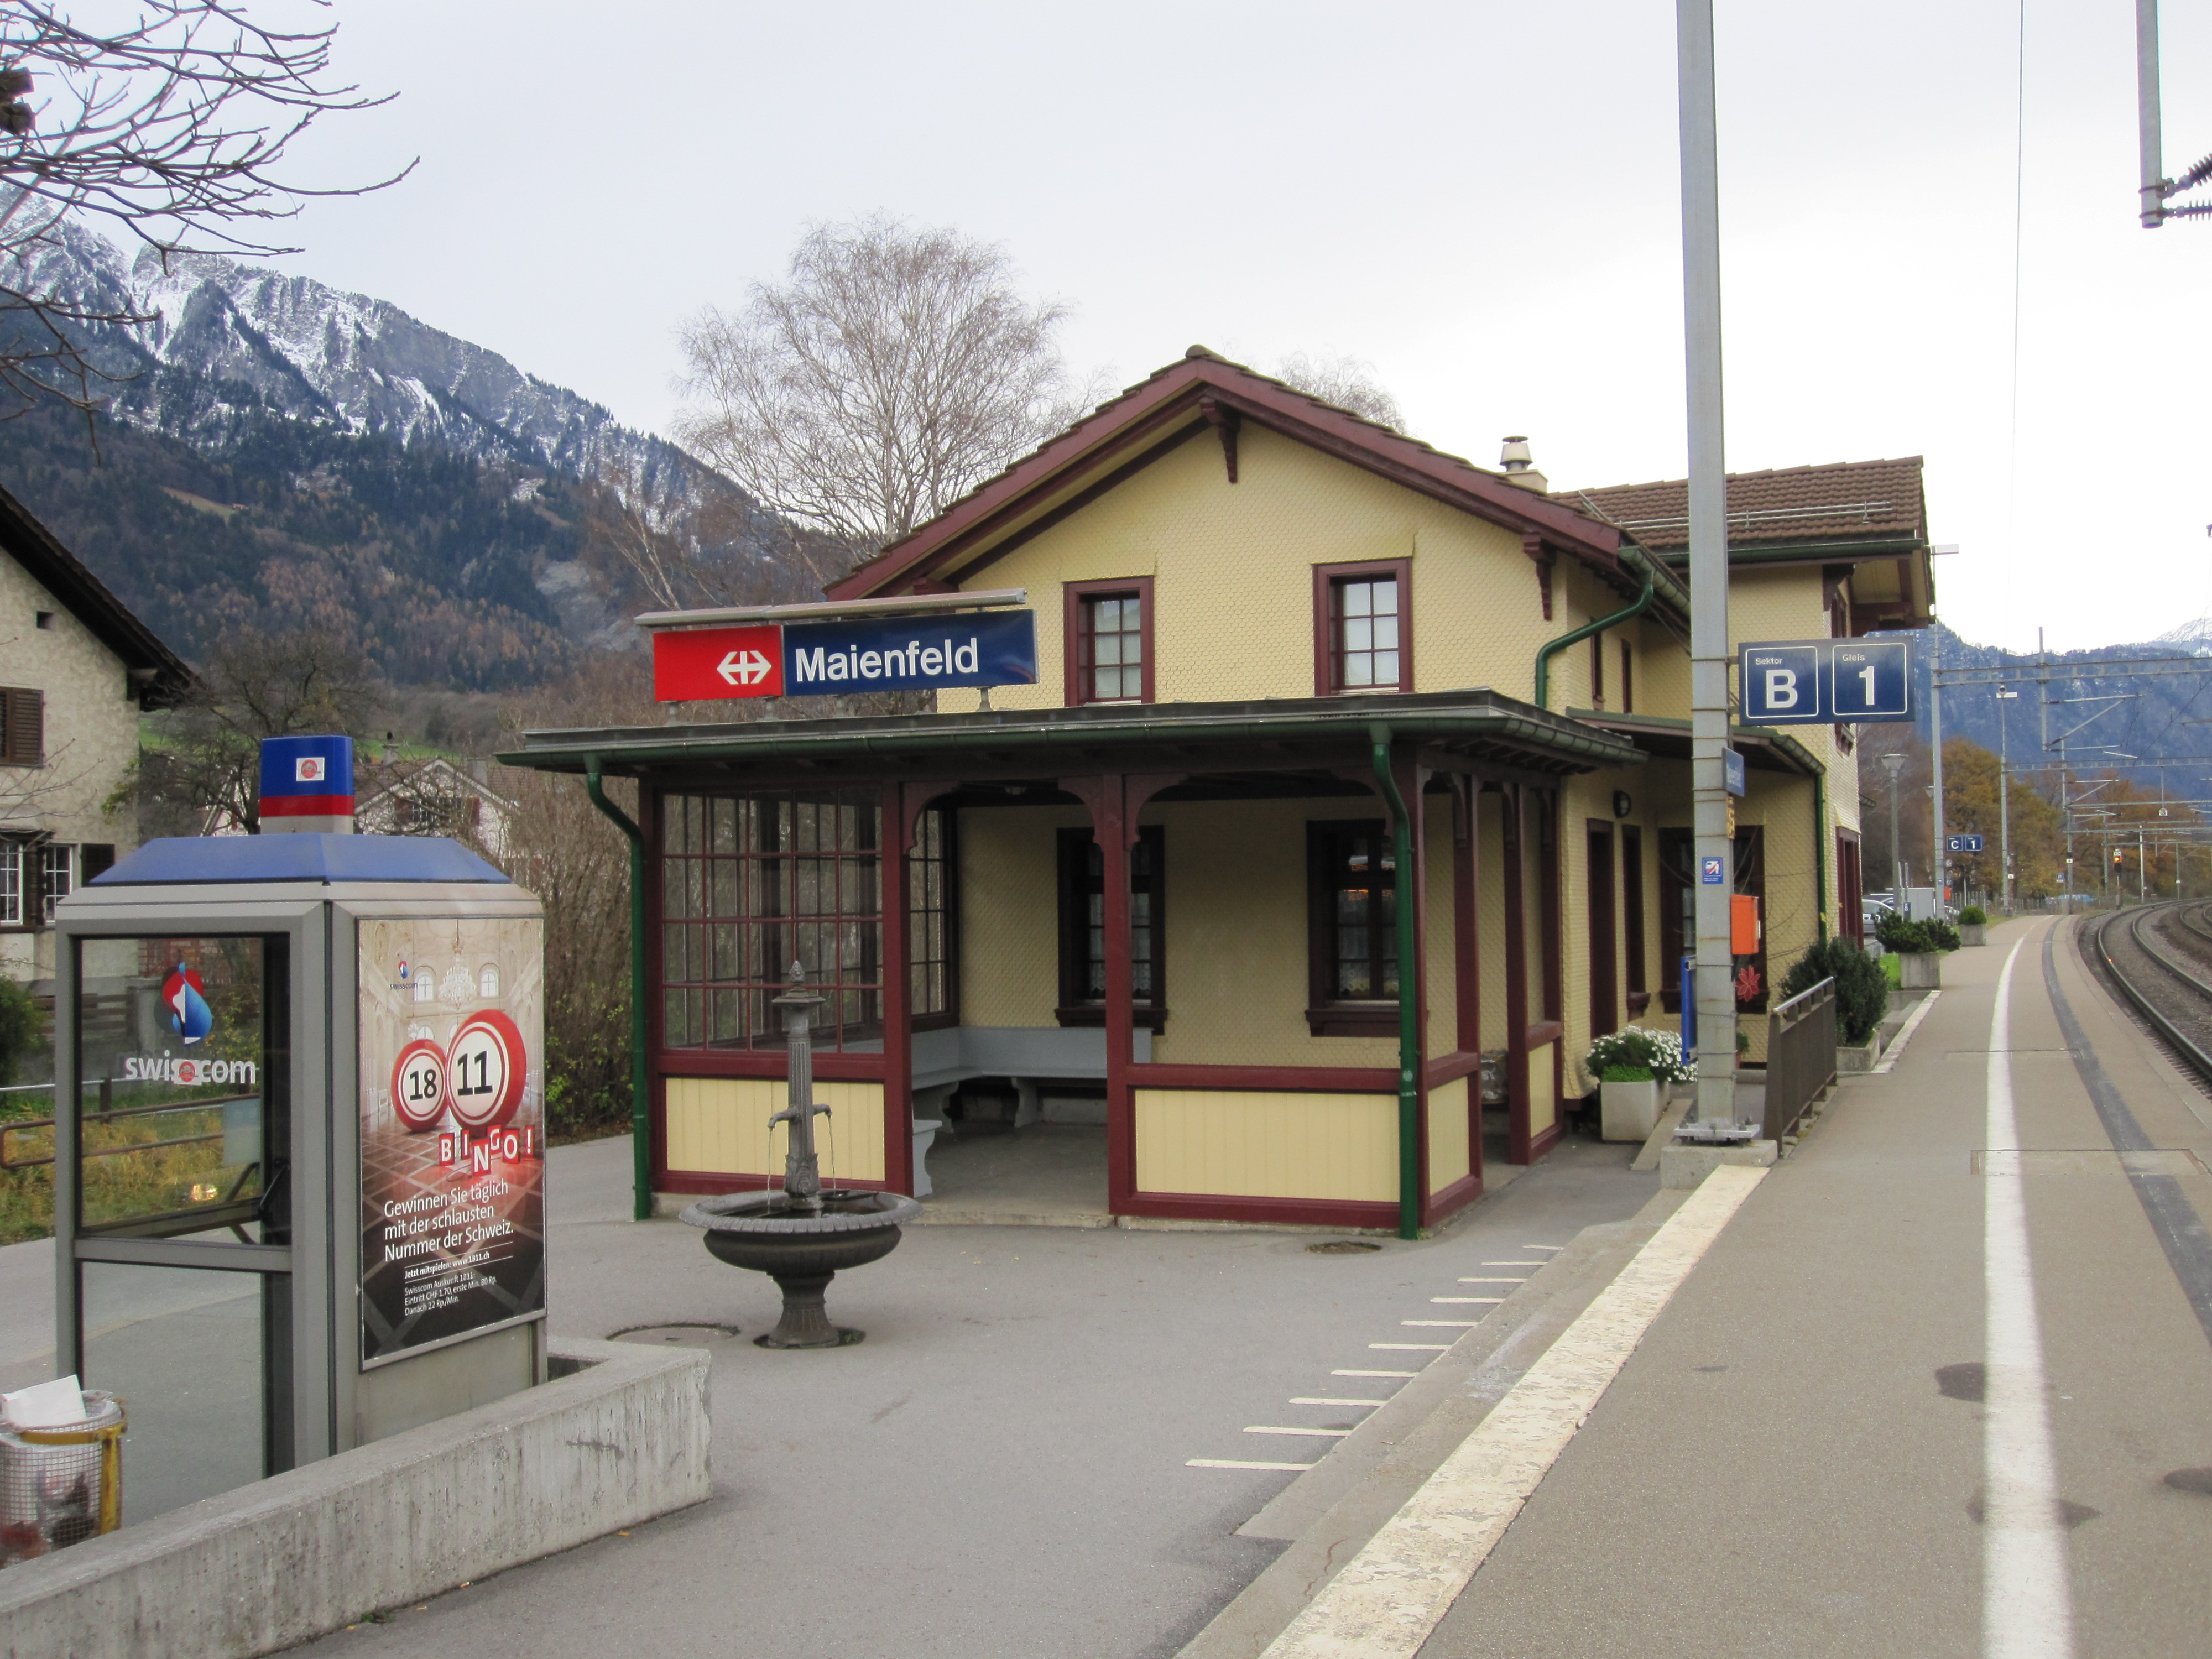 https://upload.wikimedia.org/wikipedia/commons/5/58/Bahnhof_Maienfeld_1.jpg